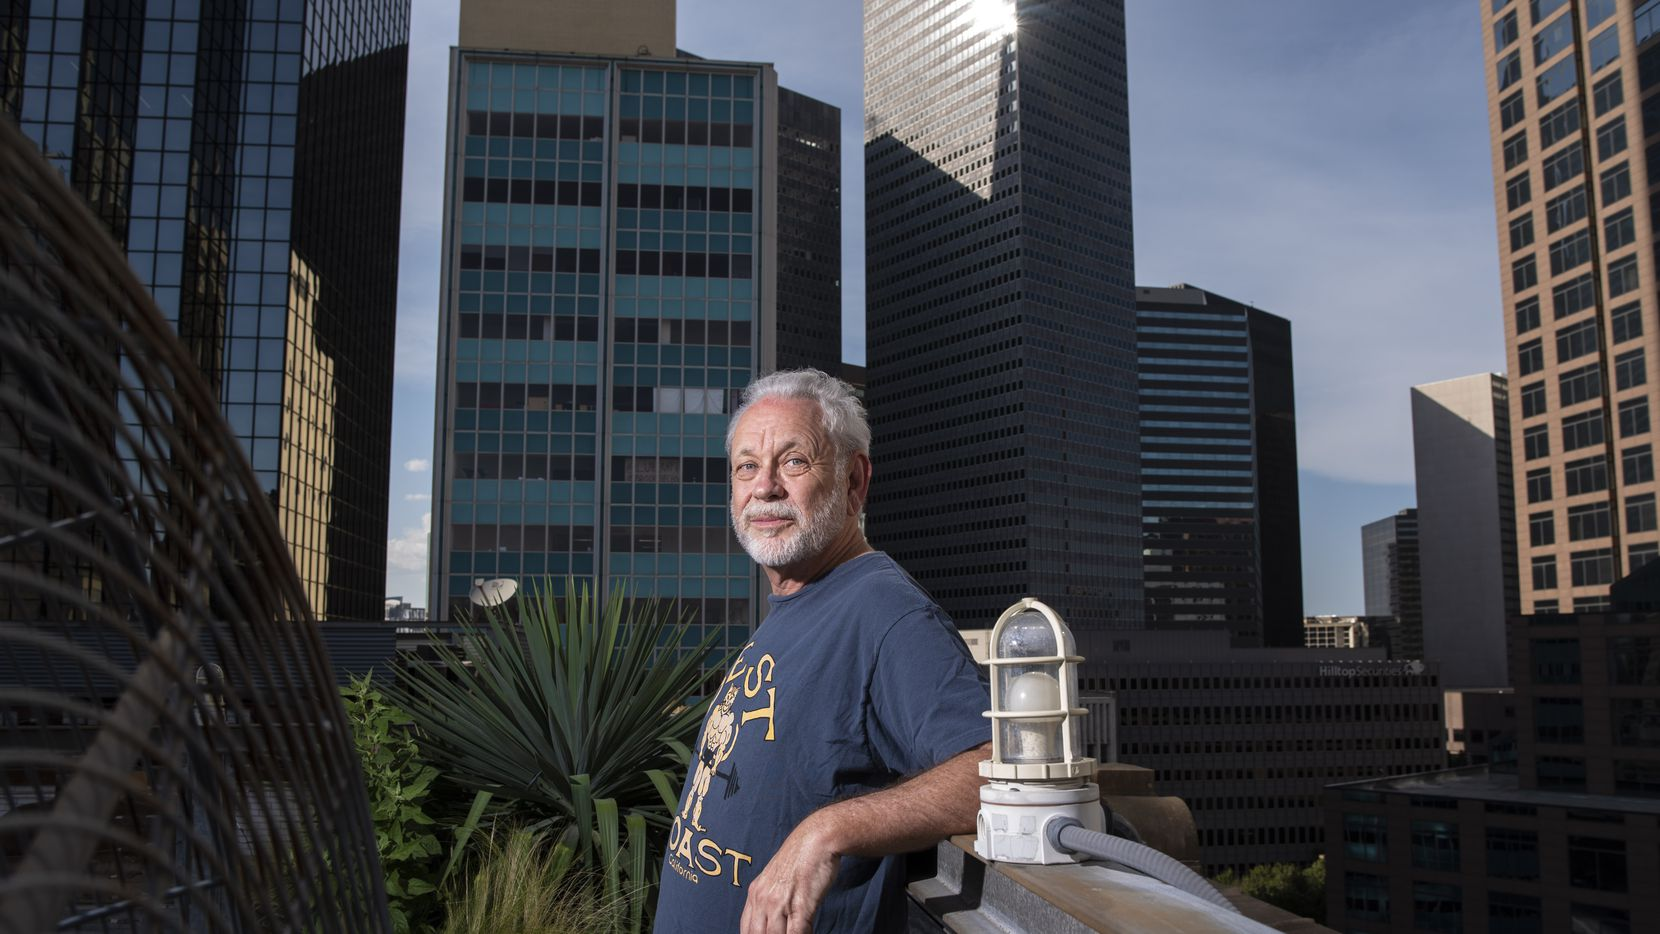 Lifelong Dallas resident and radio legend Mike Rhyner